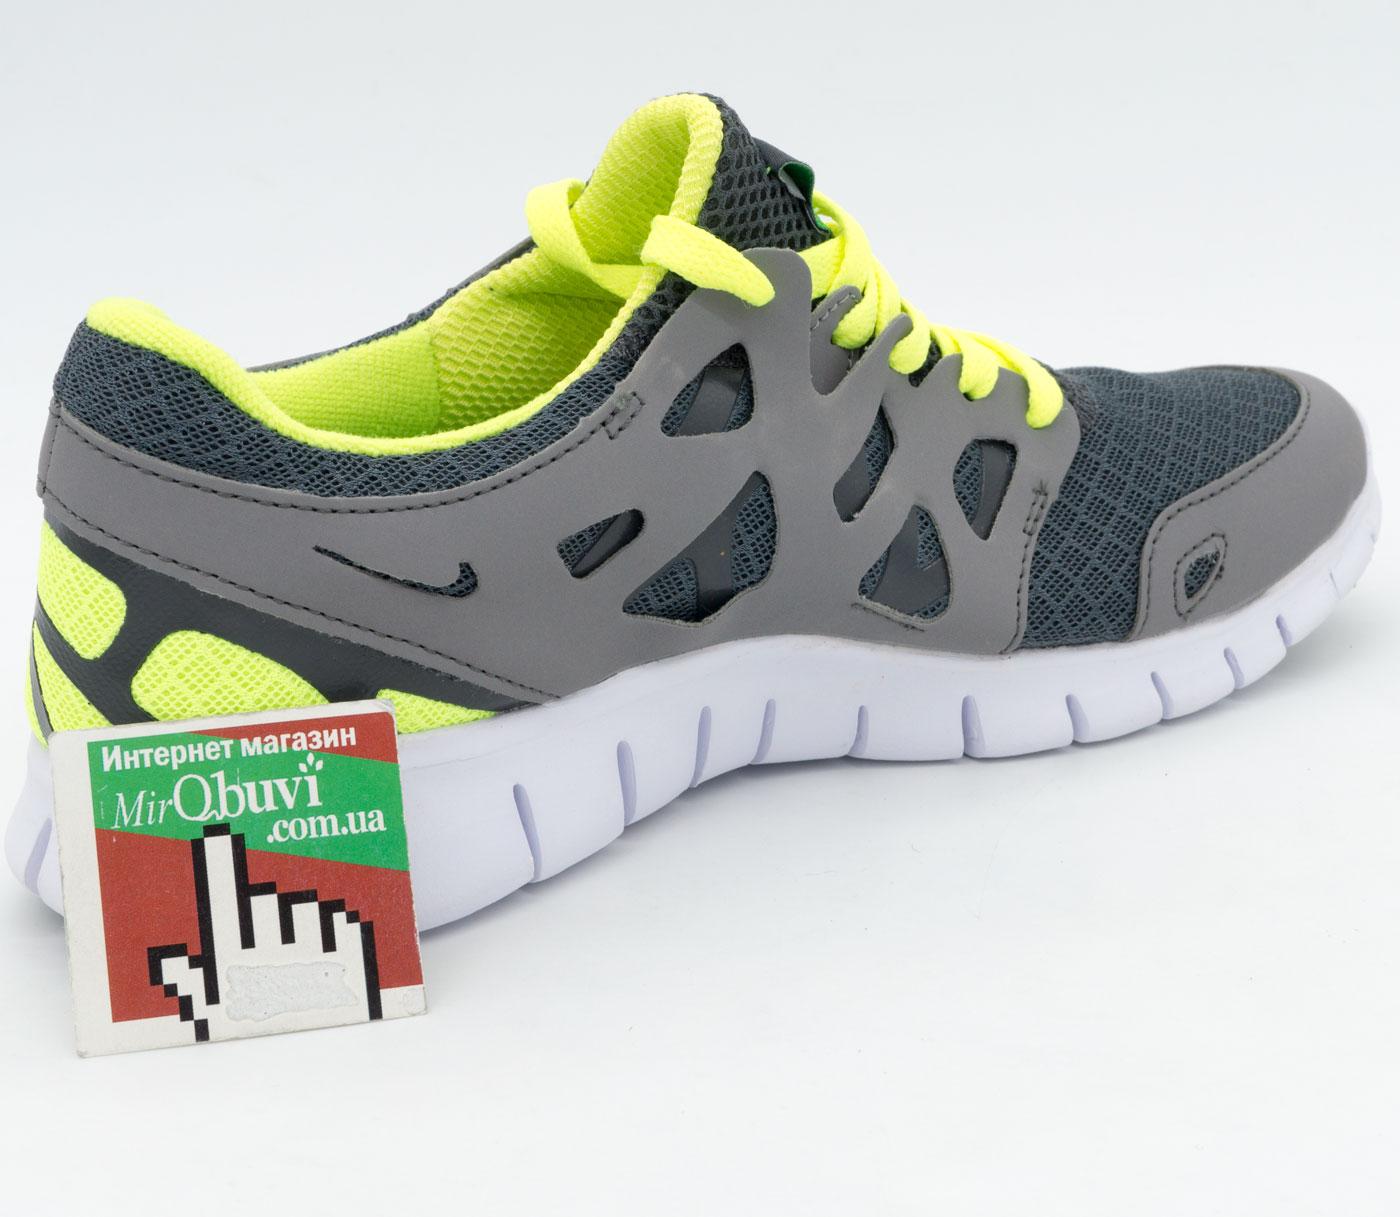 фото back Кроссовки для бега Nike Free Run 2 Найк Фри Ран, серо-зеленые back